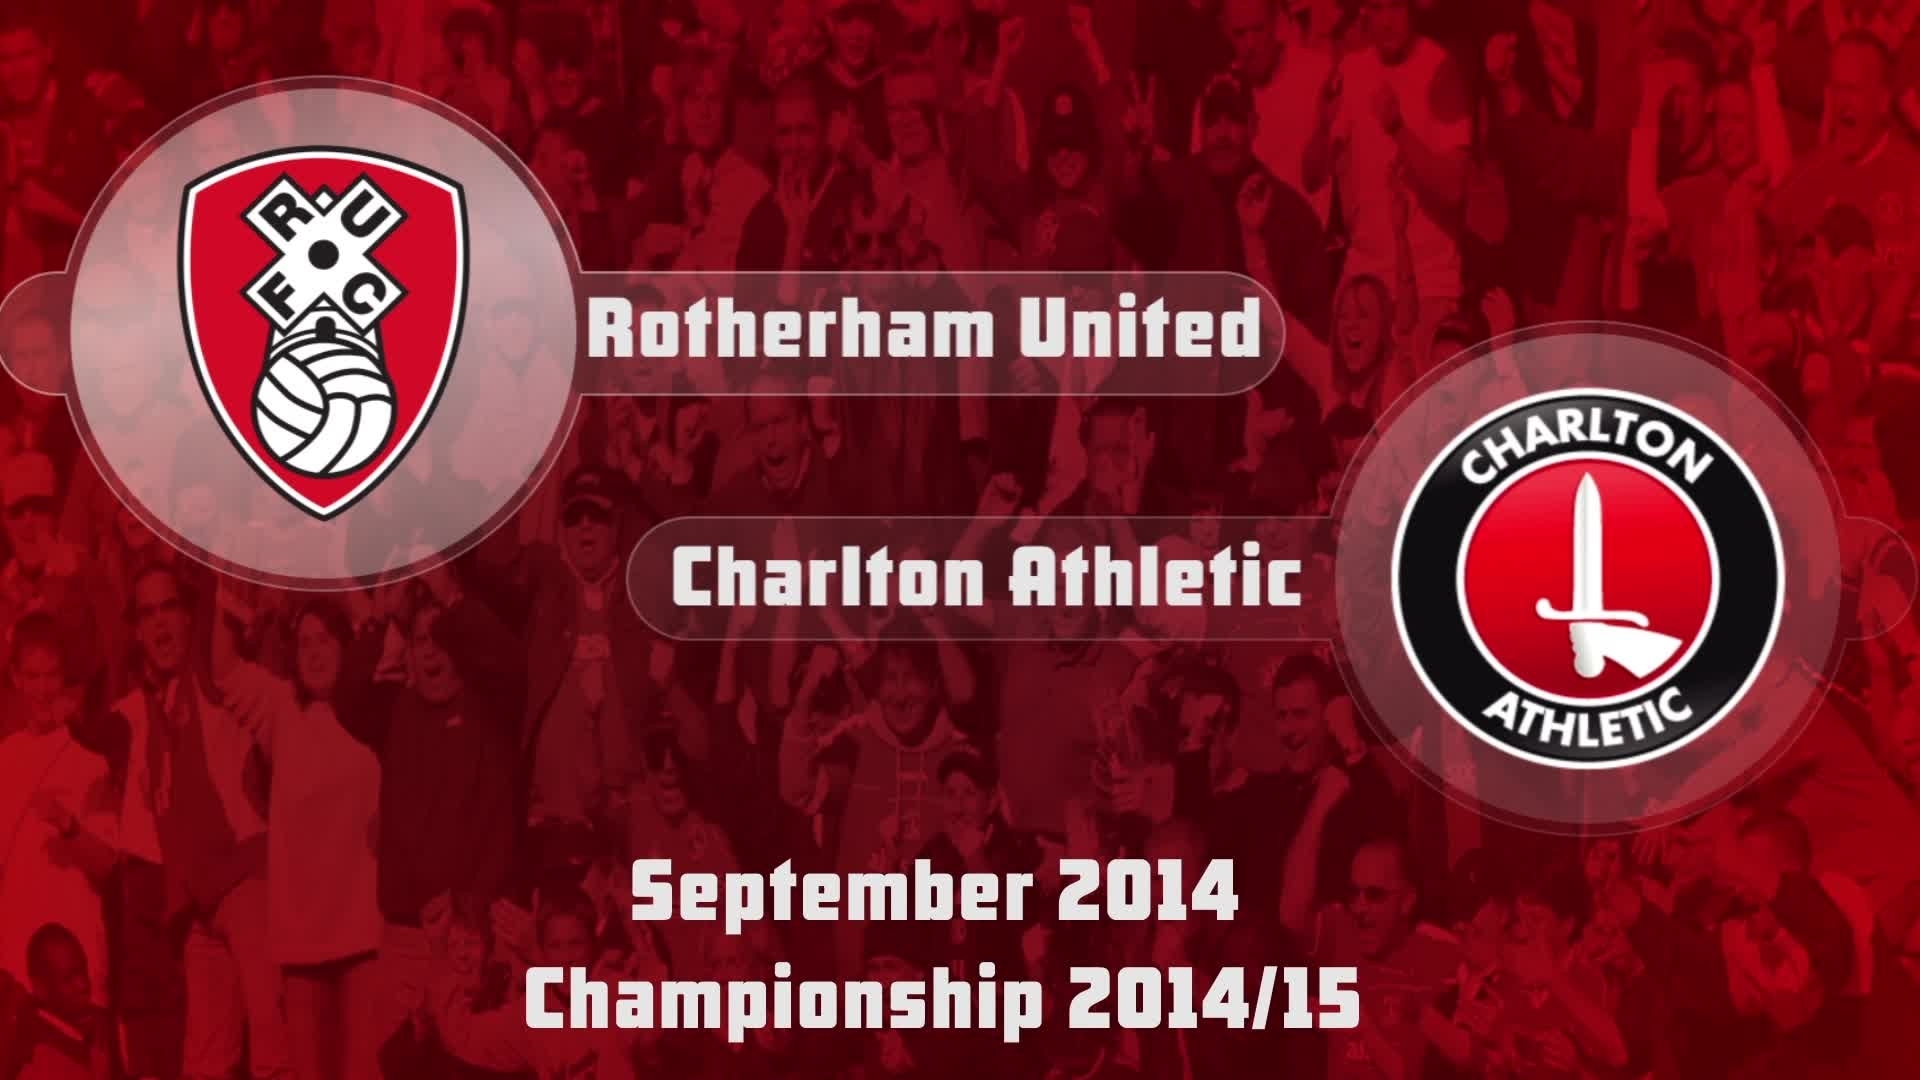 10 HIGHLIGHTS | Rotherham 1 Charlton 1 (Sept 2014)